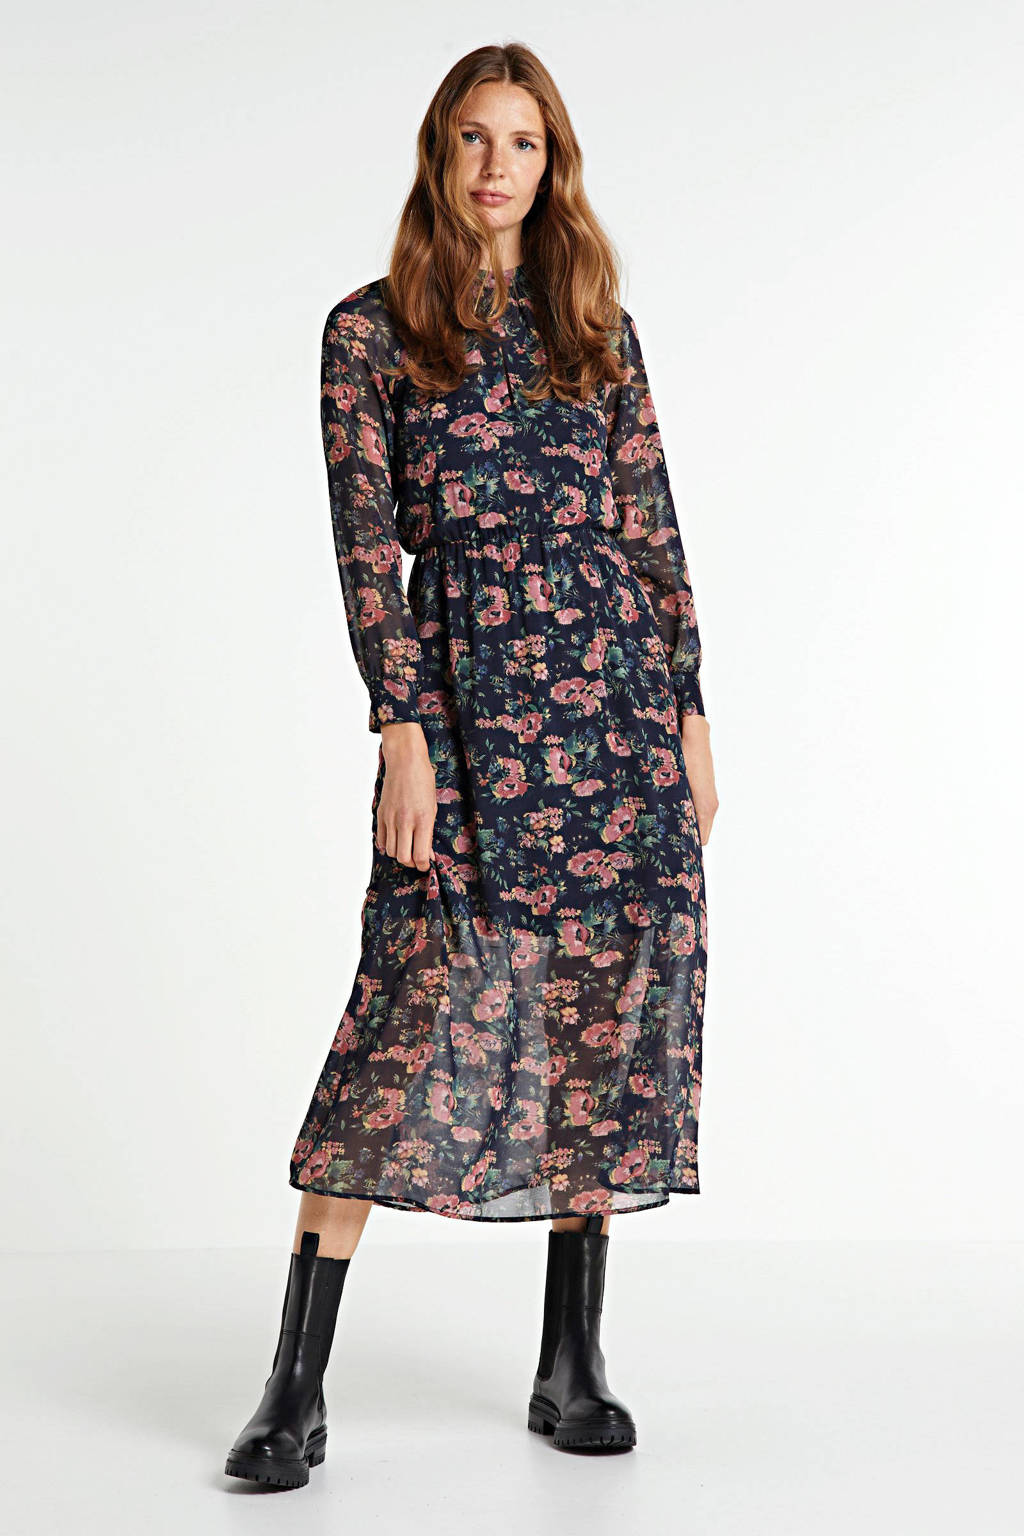 Pepe Jeans gebloemde semi-transparante maxi jurk Mariana donkerblauw/roze, Donkerblauw/roze